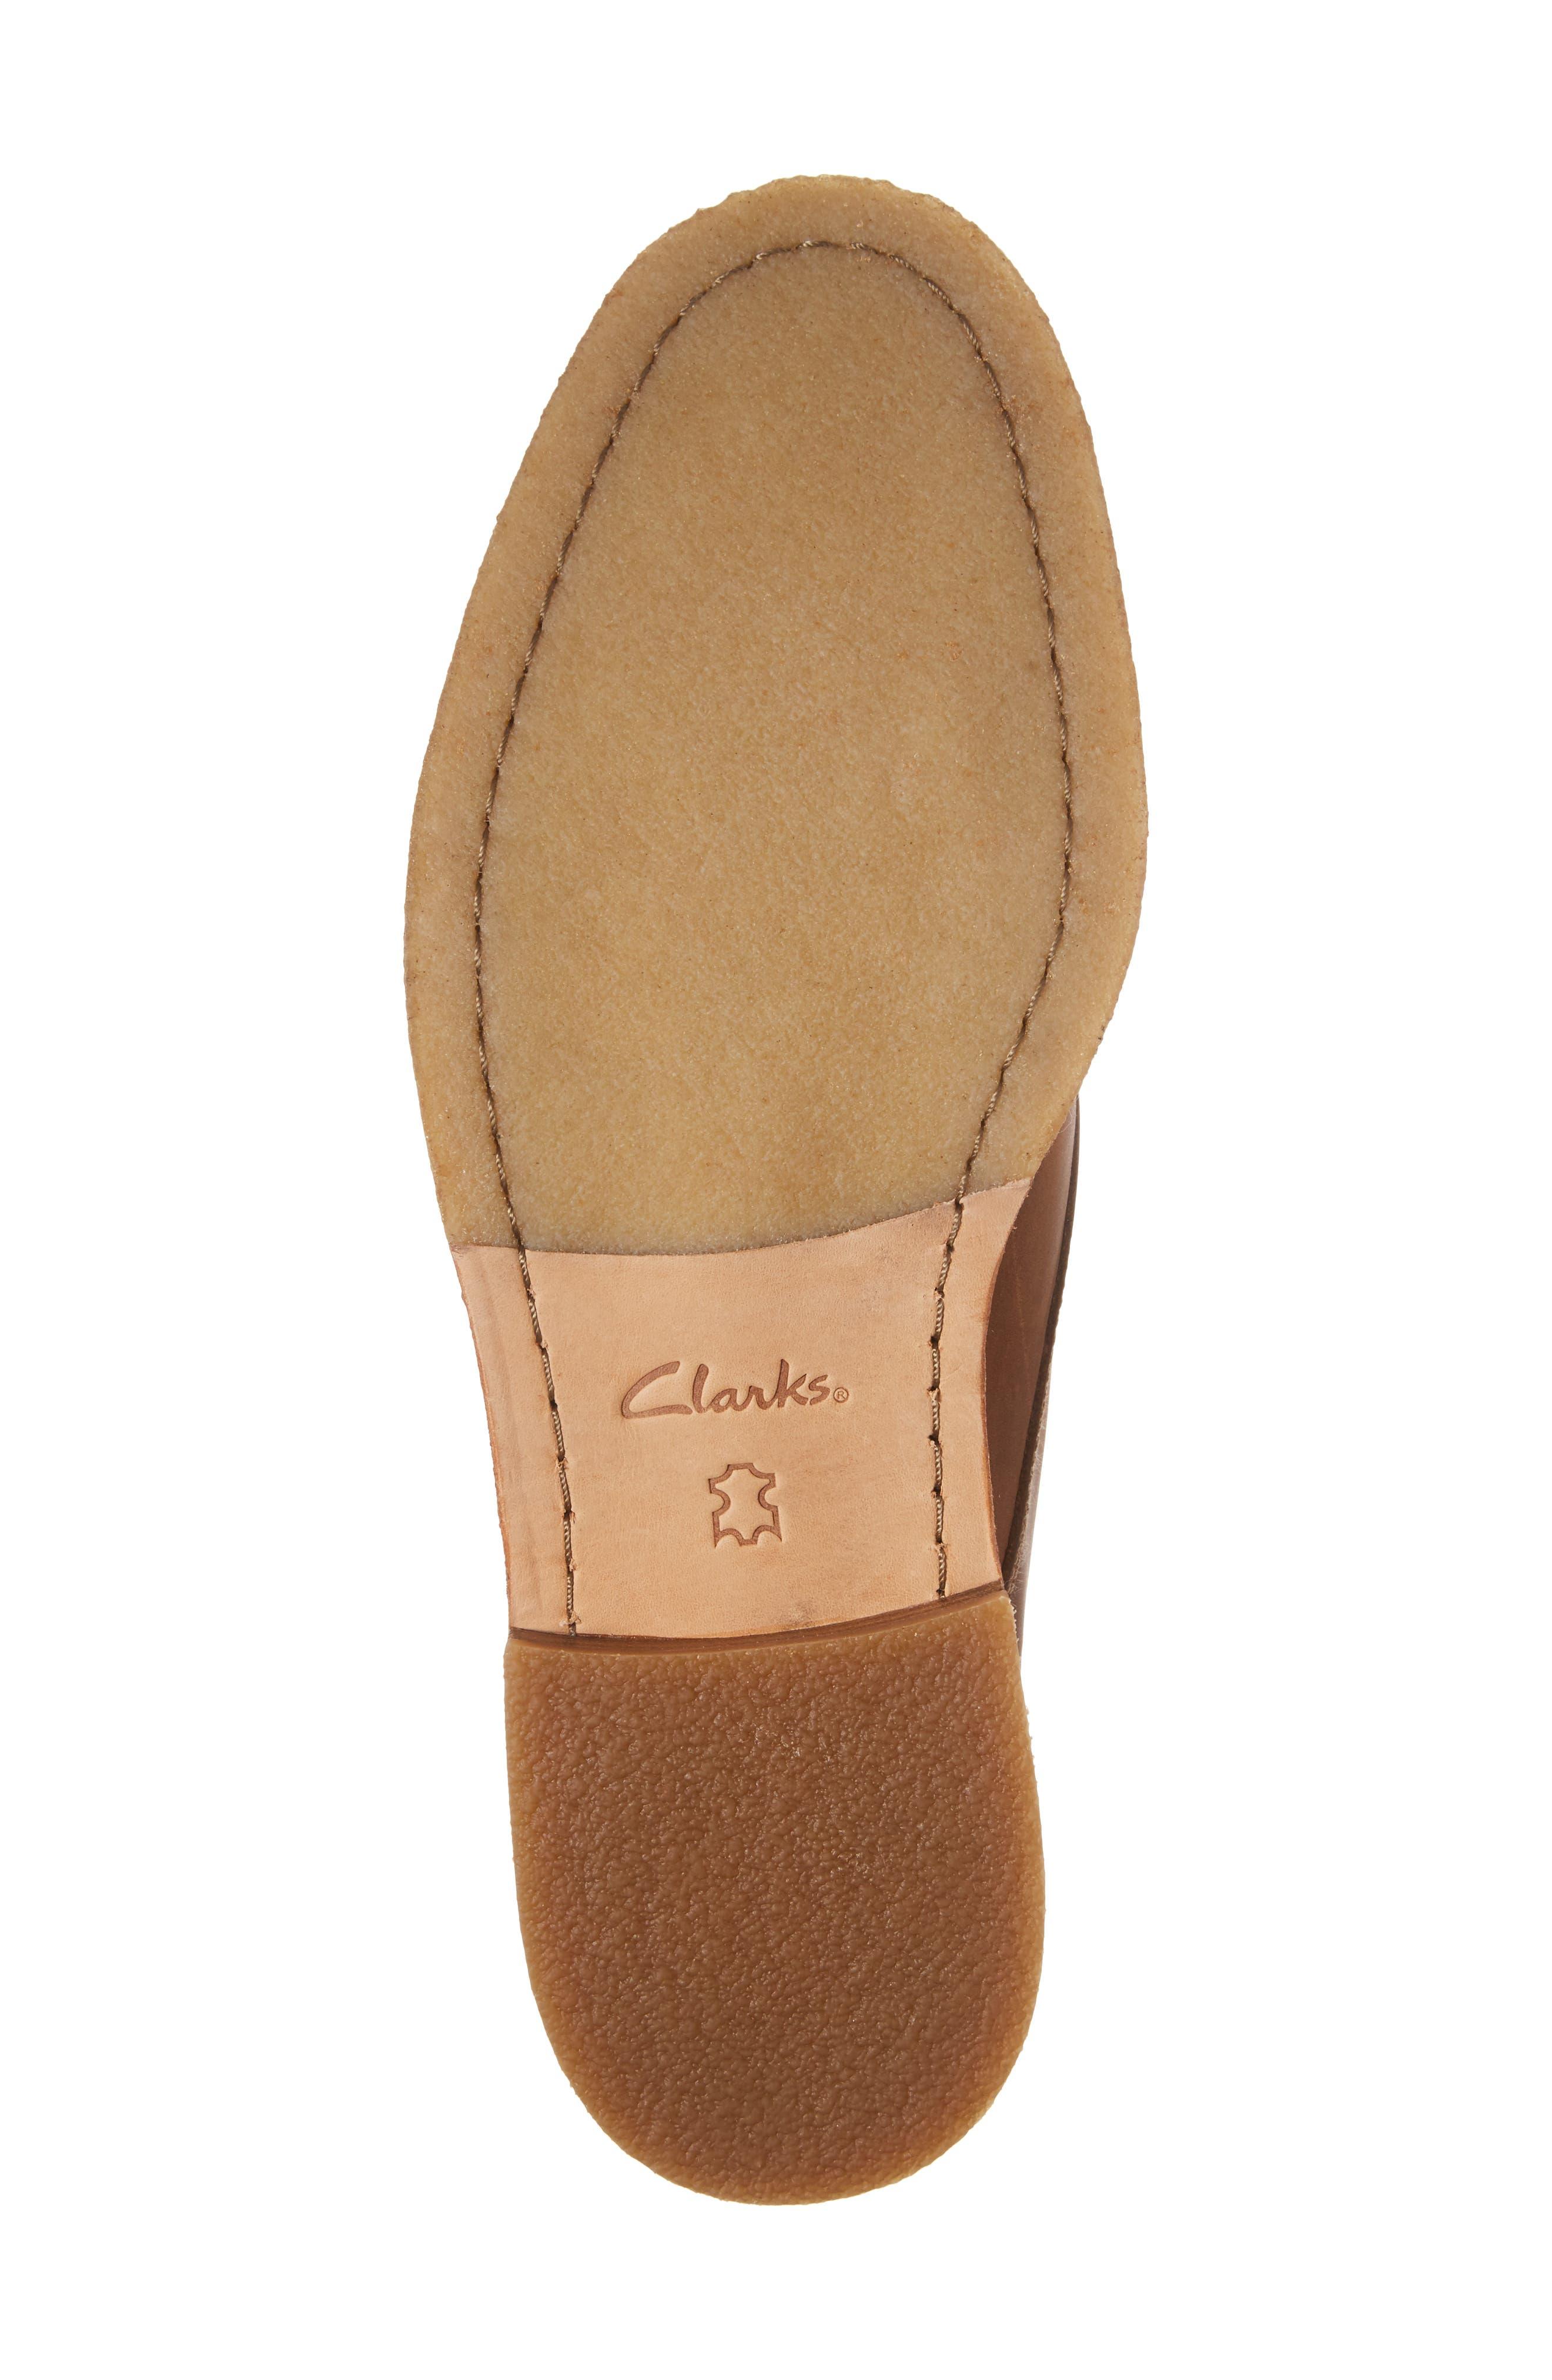 Clarks Clarkdale Moon Buck Shoe,                             Alternate thumbnail 18, color,